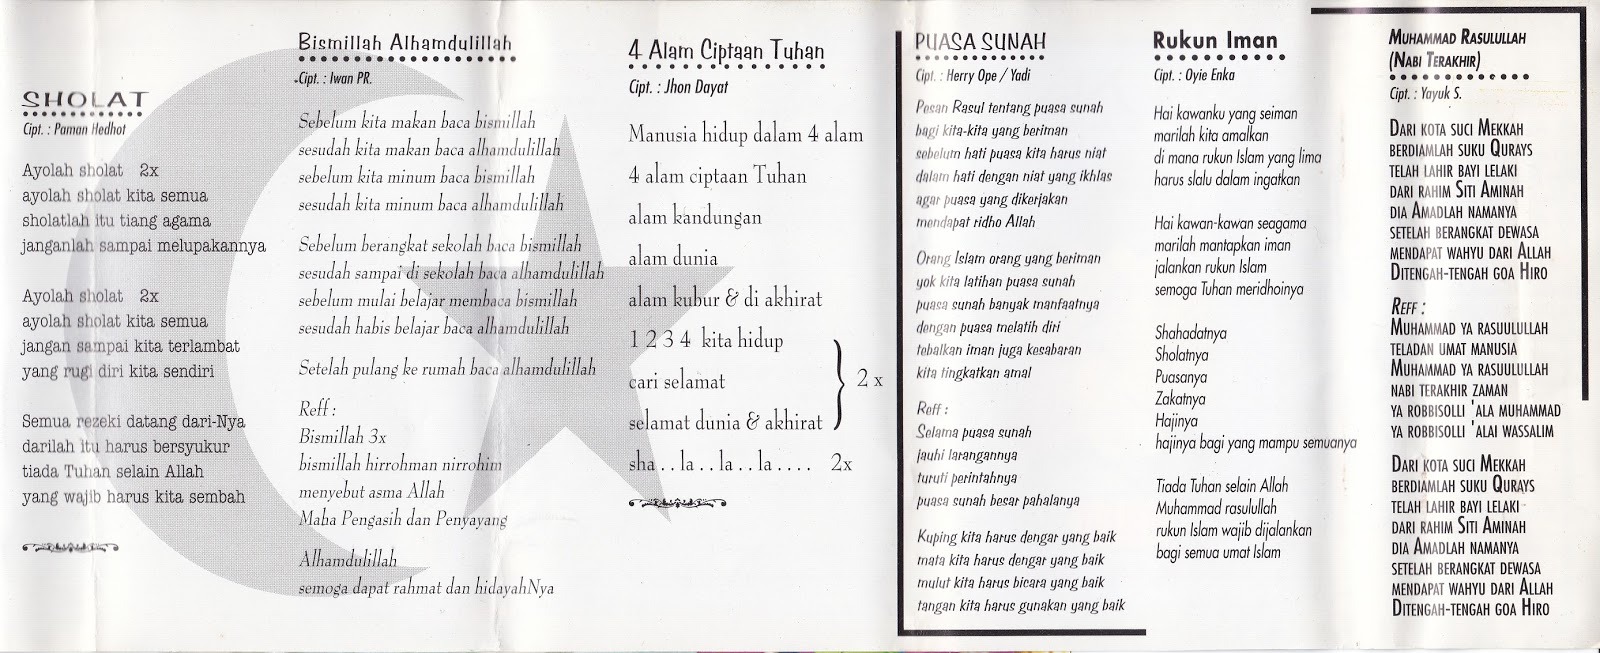 Sampul Kaset Album Lagu Anak Indonesia Jaman Dulu Dhea Ananda